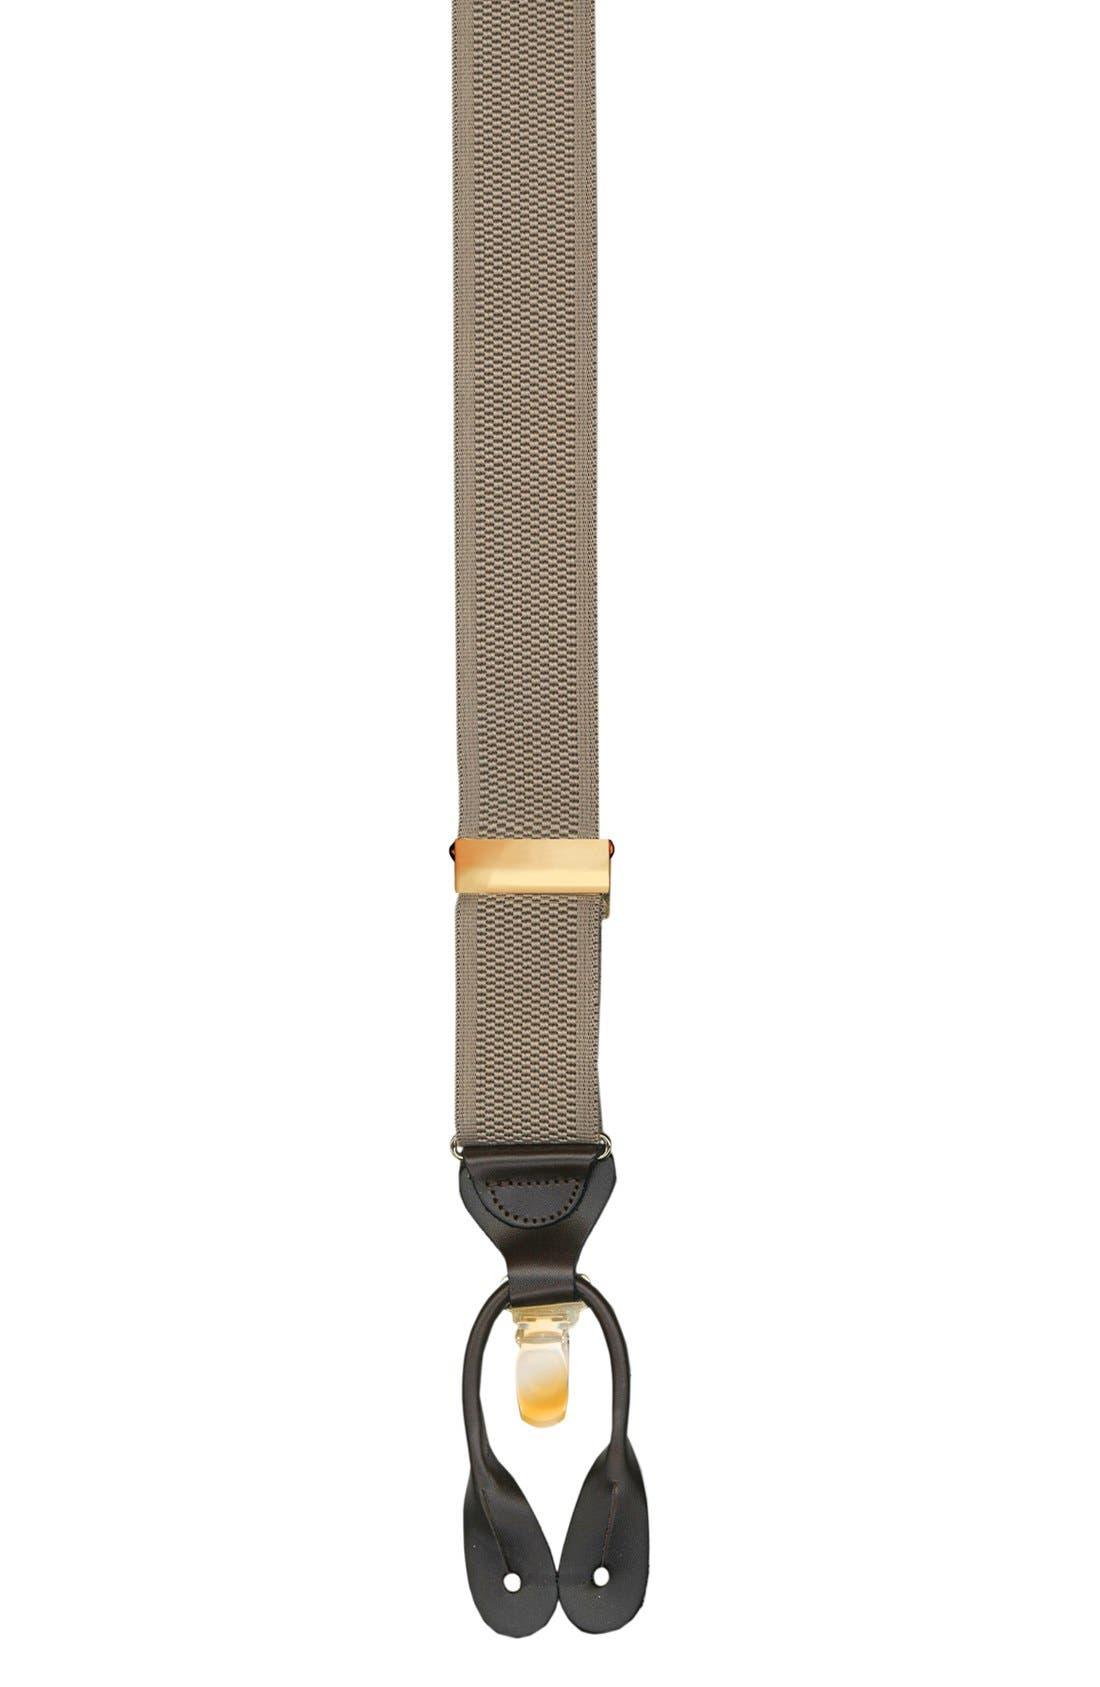 Convertible Stretch Nylon Suspenders,                             Main thumbnail 1, color,                             Khaki